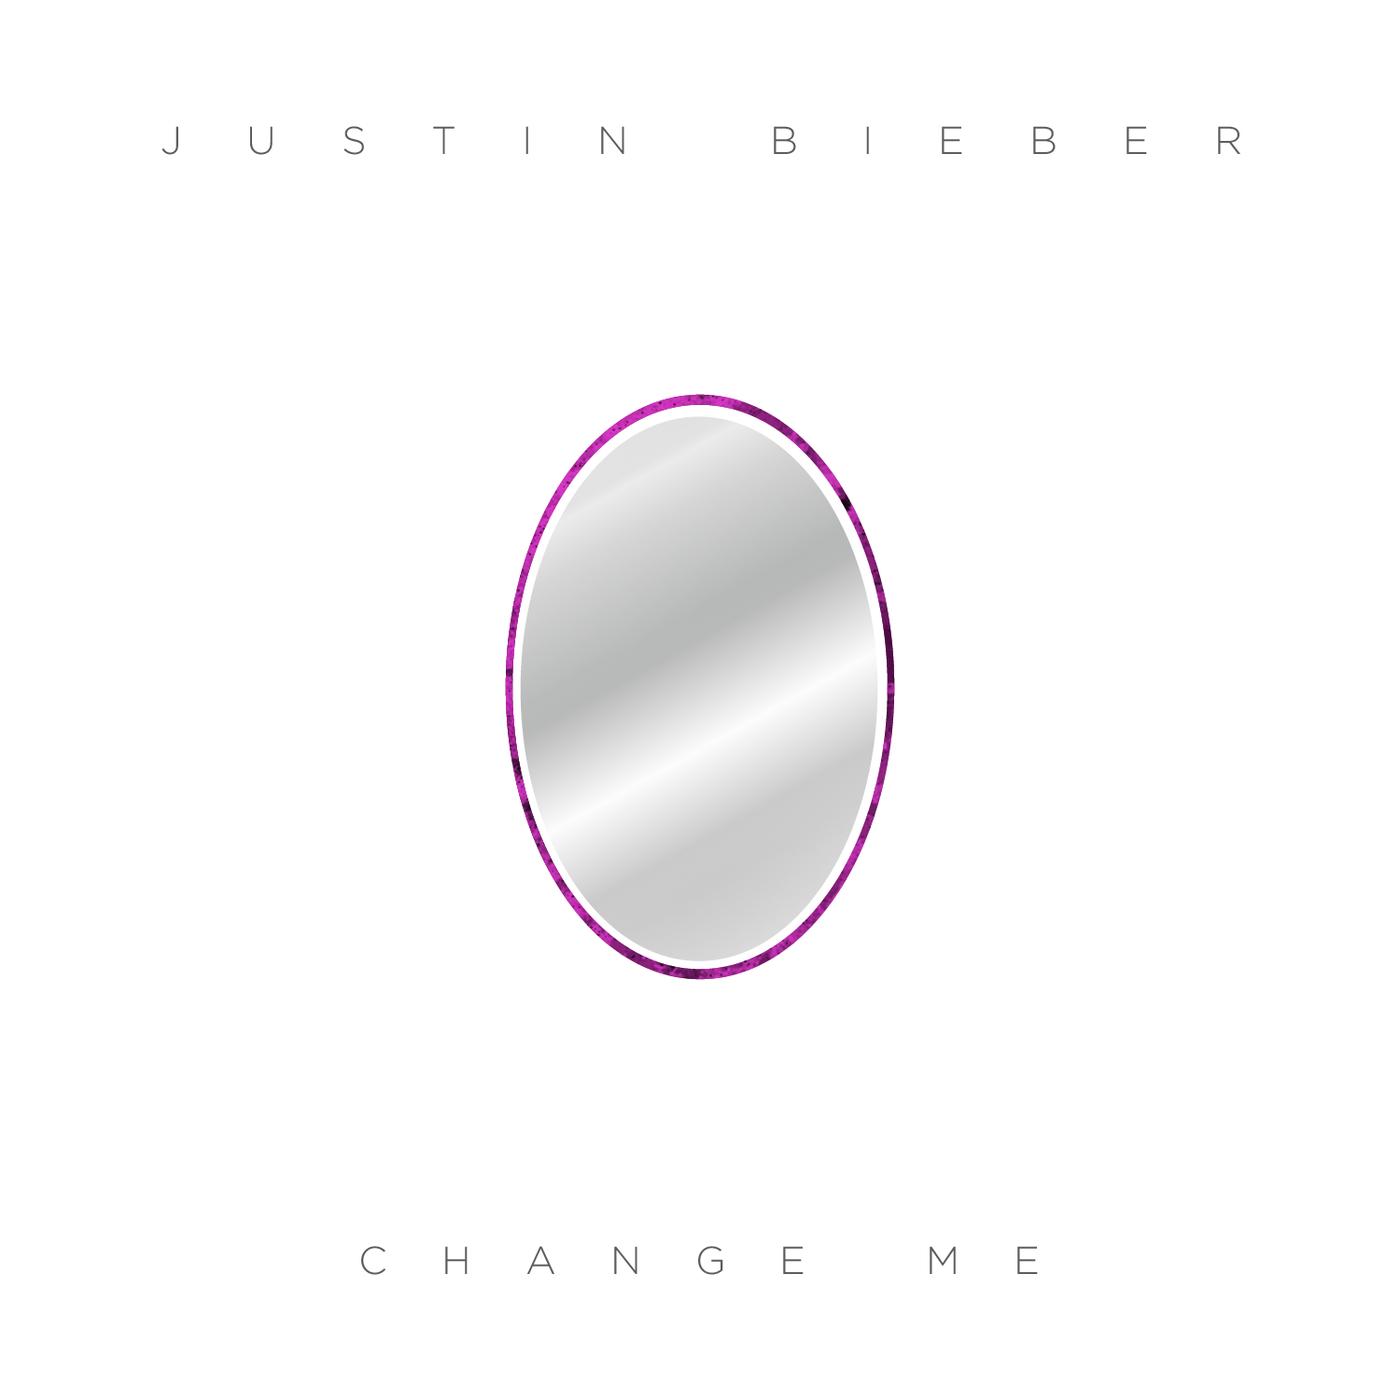 Change Me